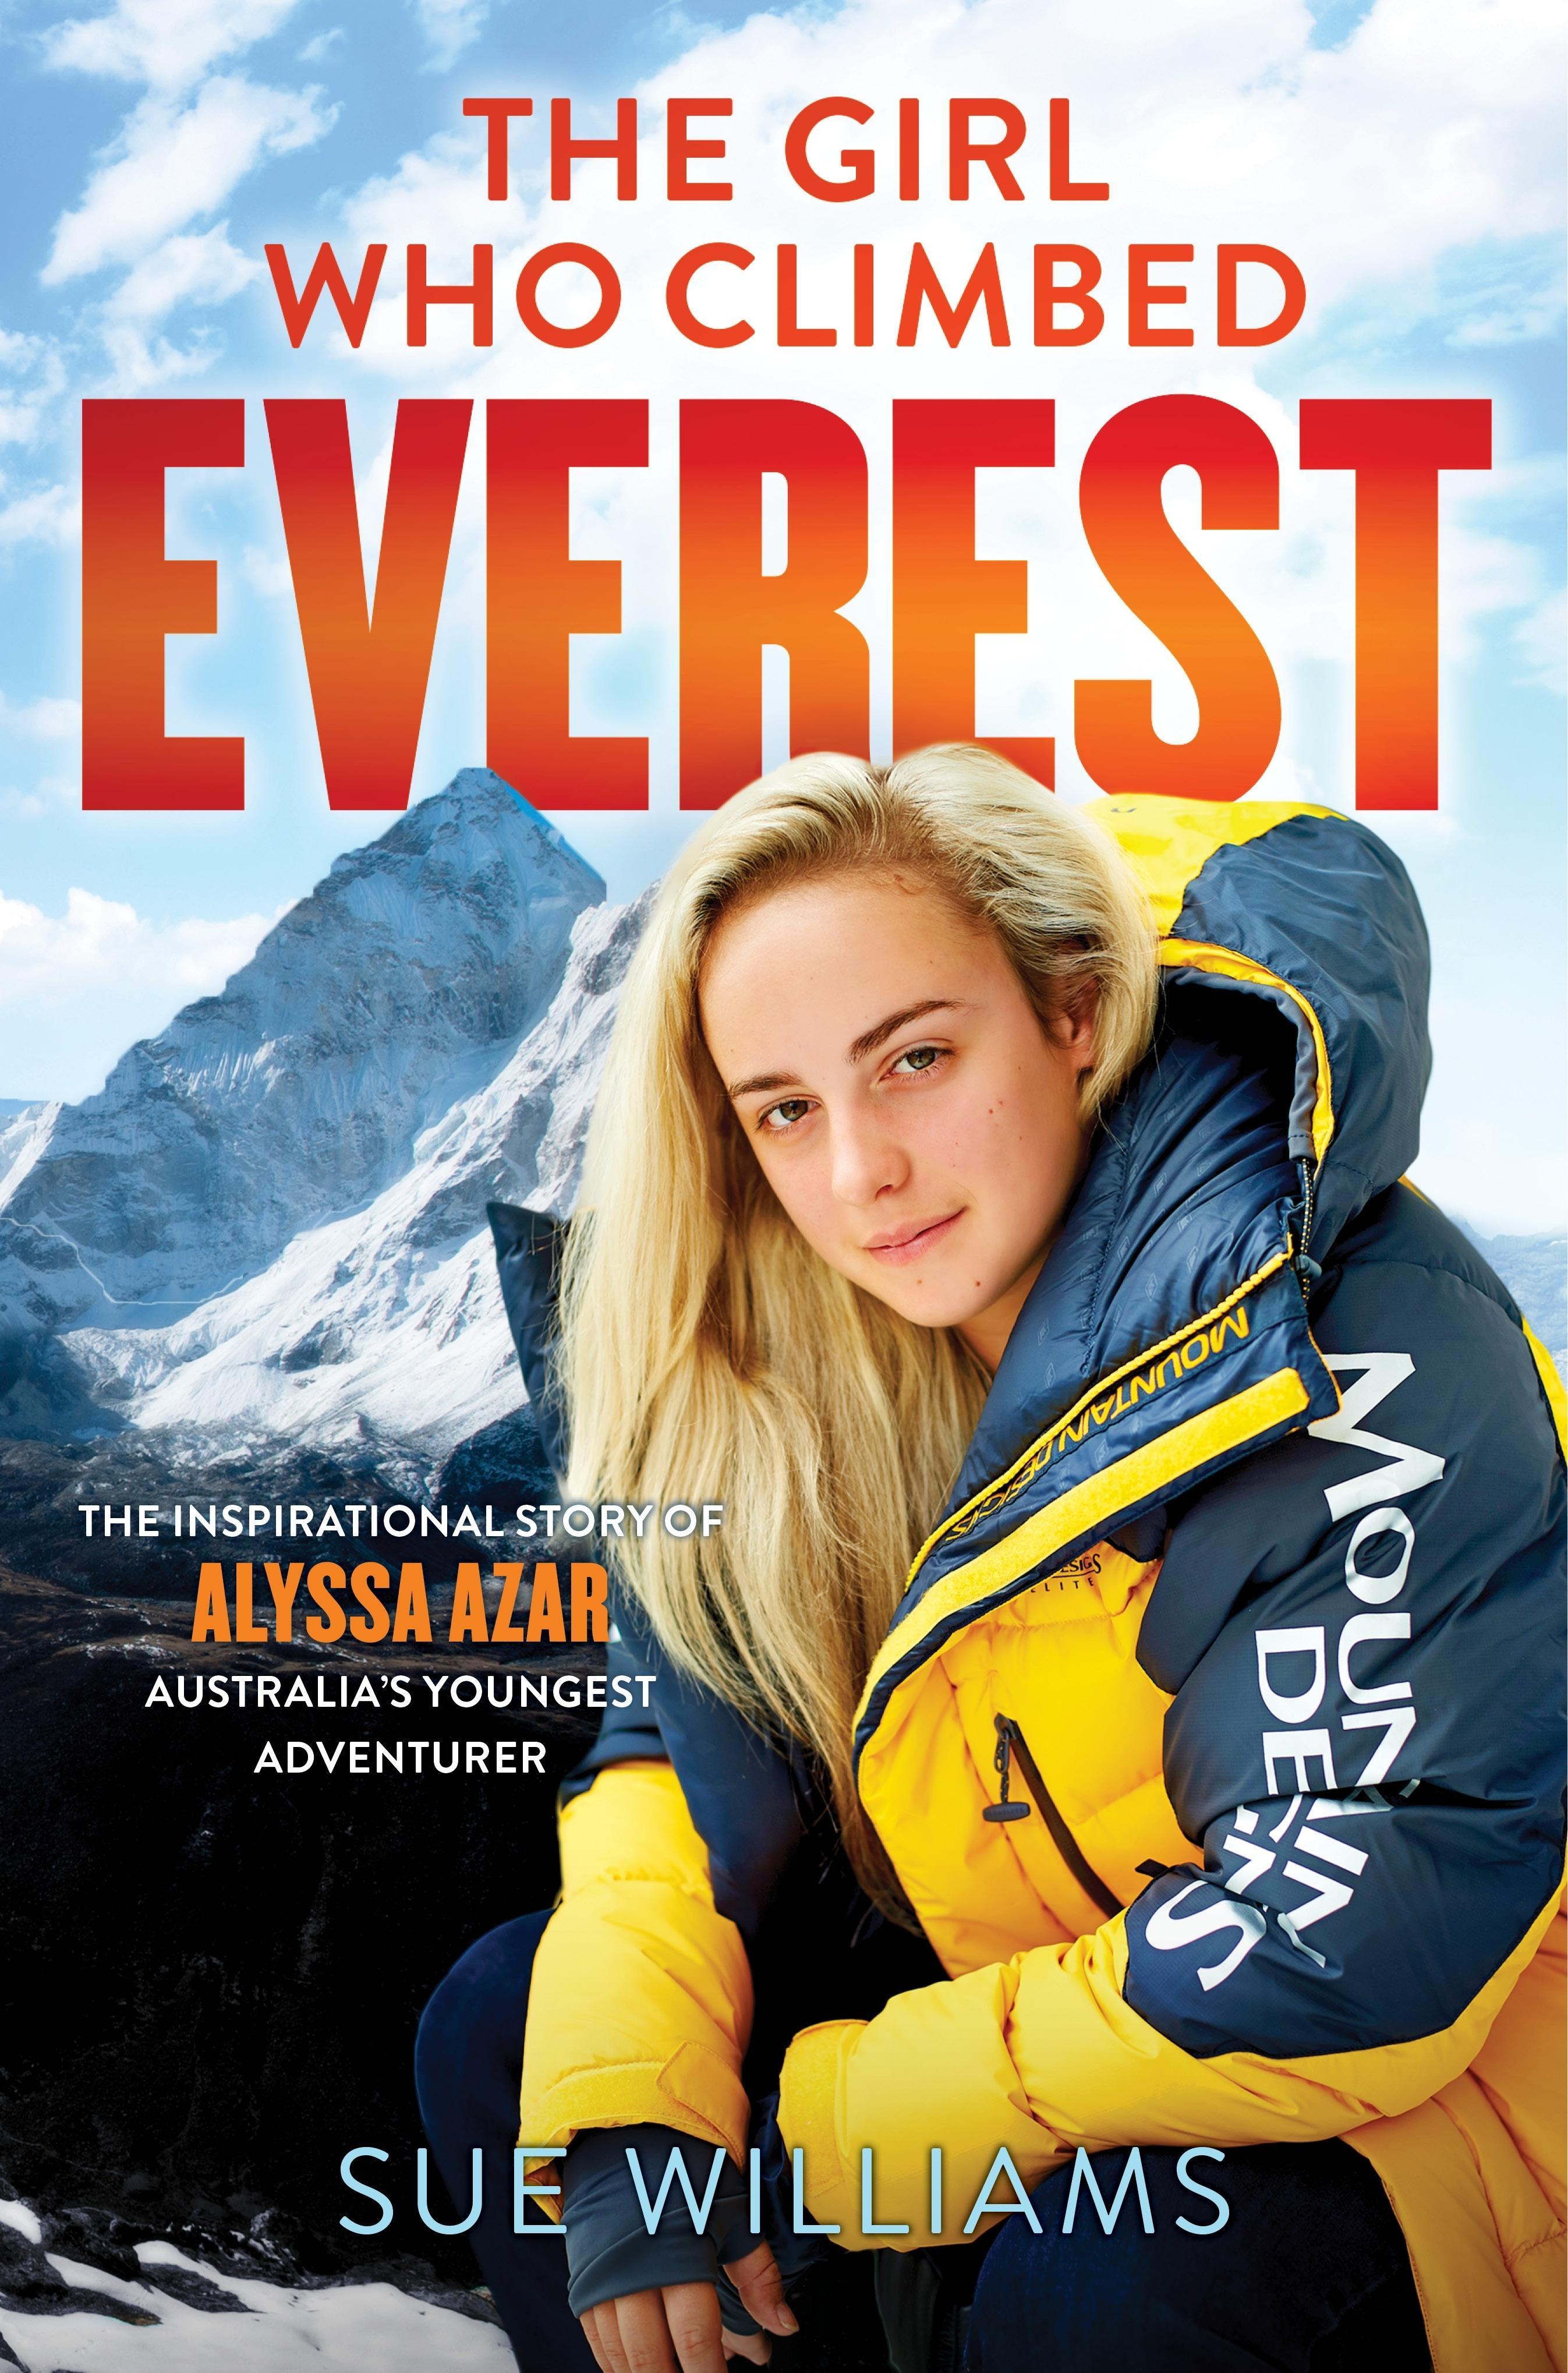 The Girl Who Climbed Everest: The inspirational story of Alyssa Azar, Australia'sYoungestAdventurer